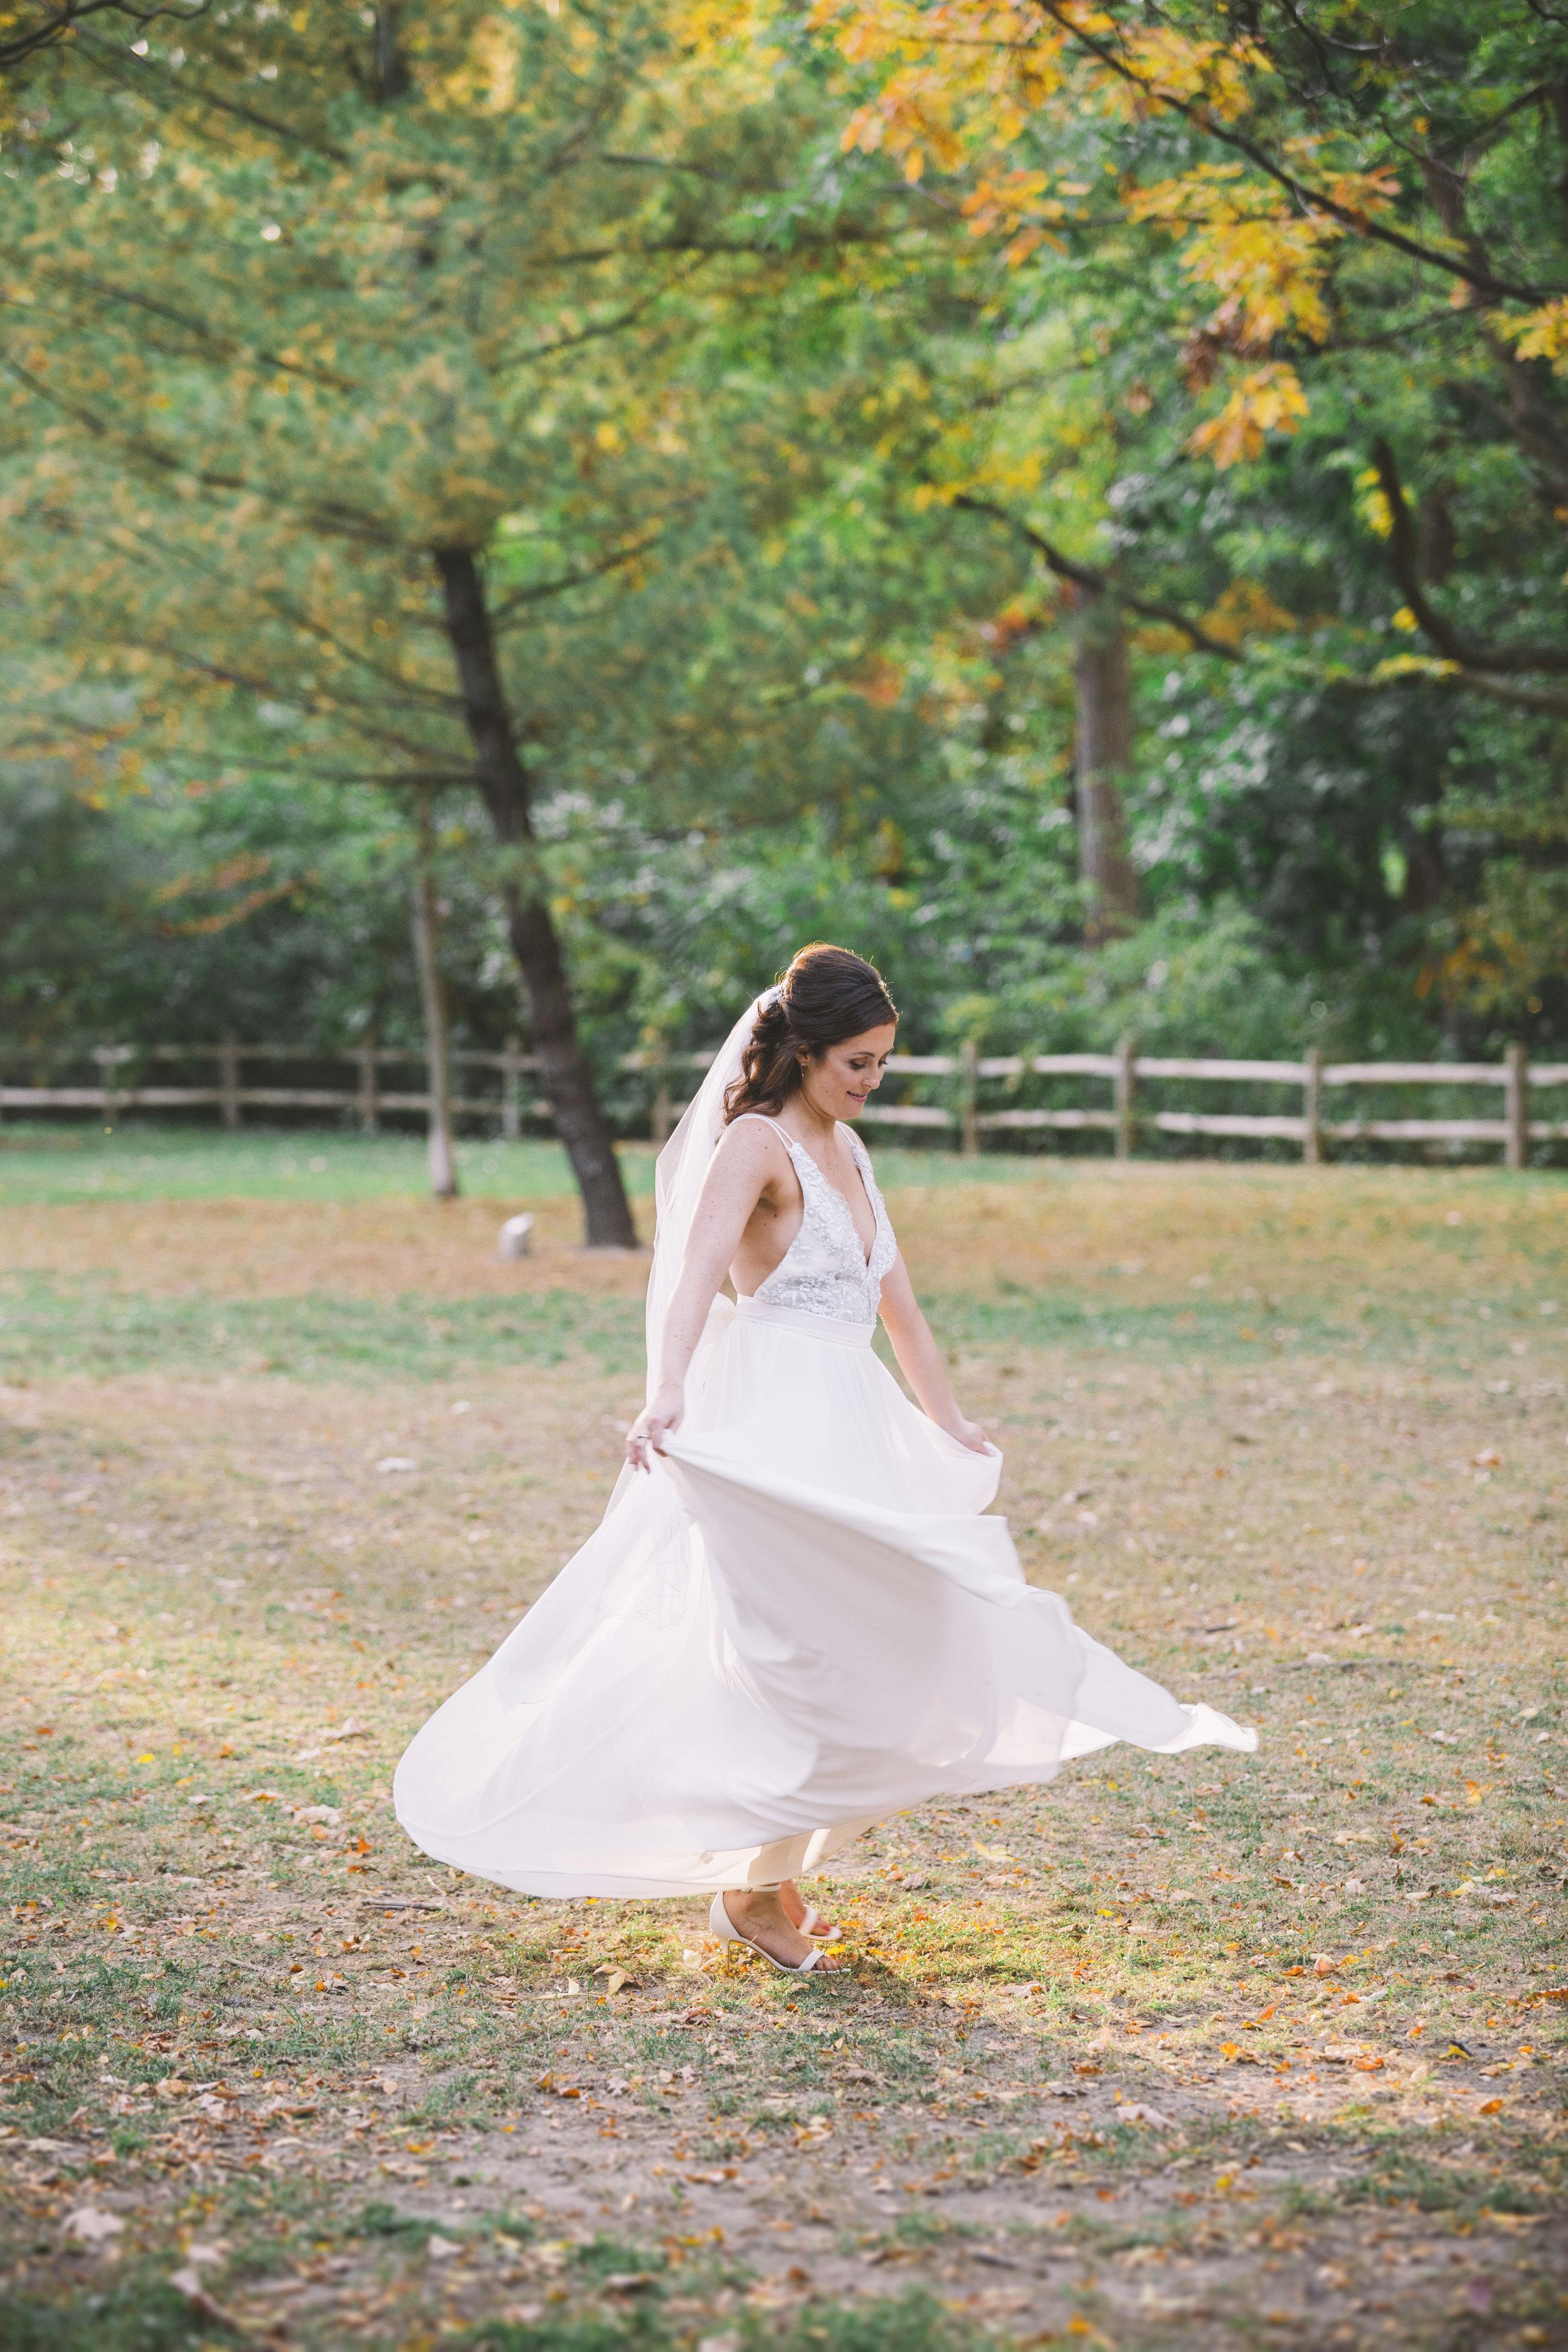 Bride twirling in wedding dress in the fall.